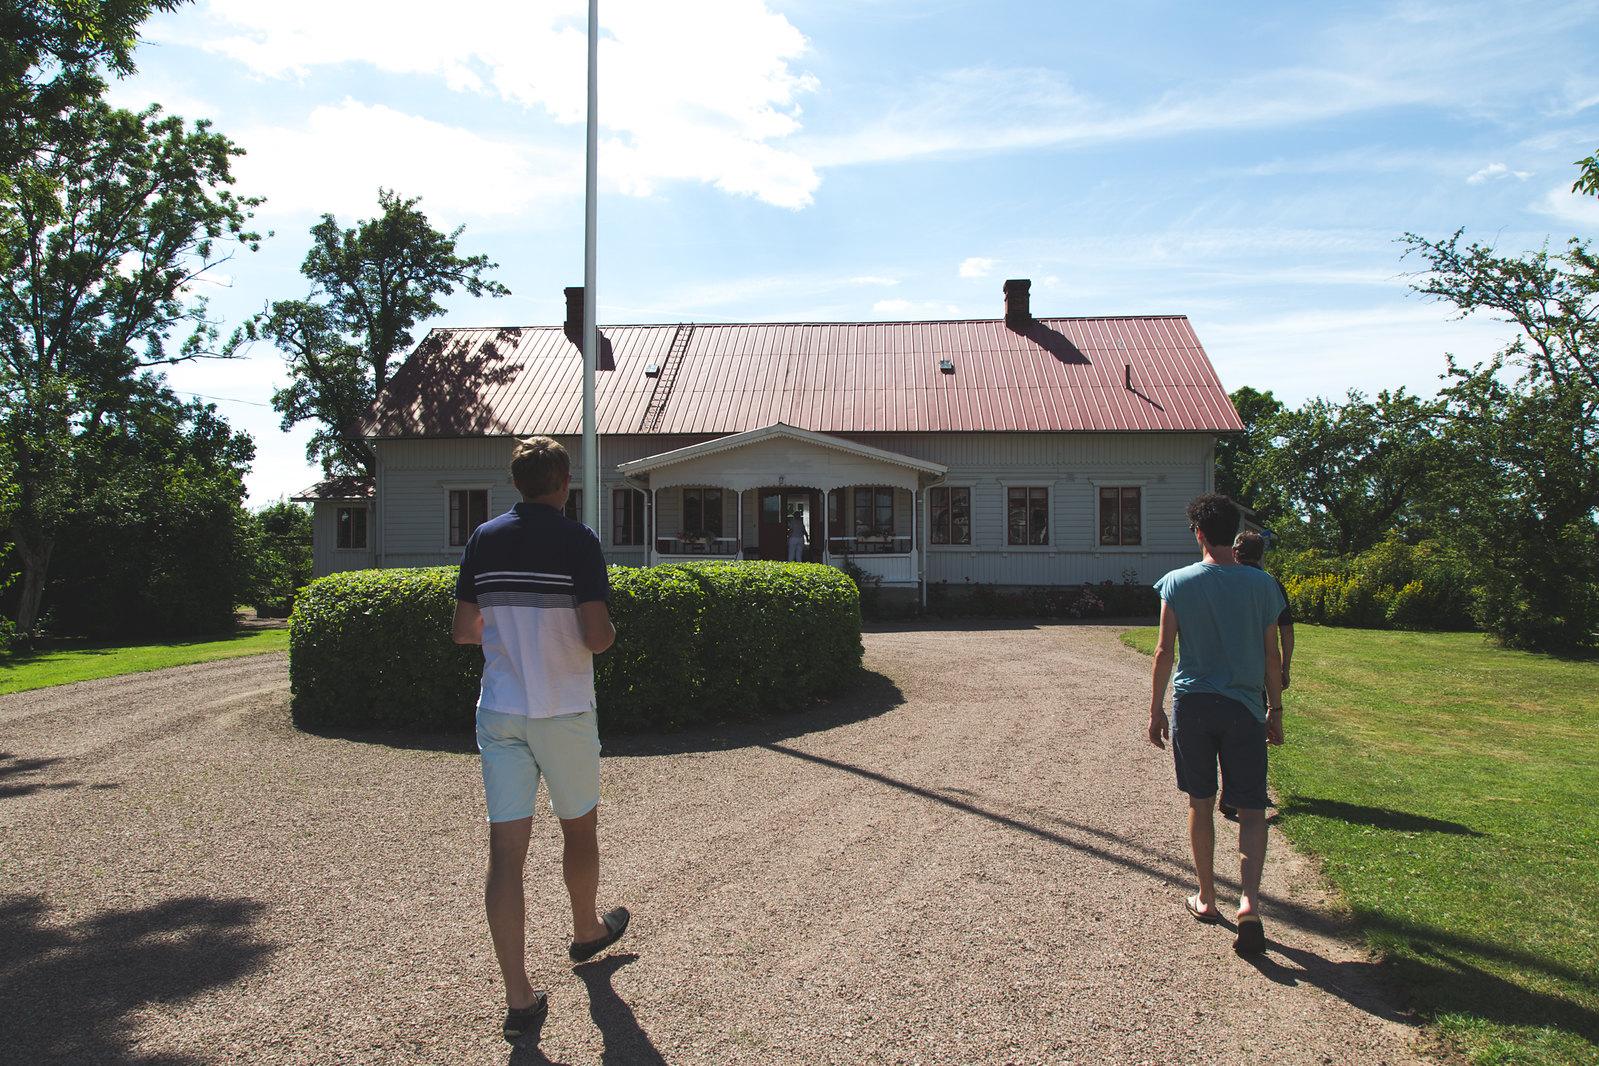 Karlslunds garden café